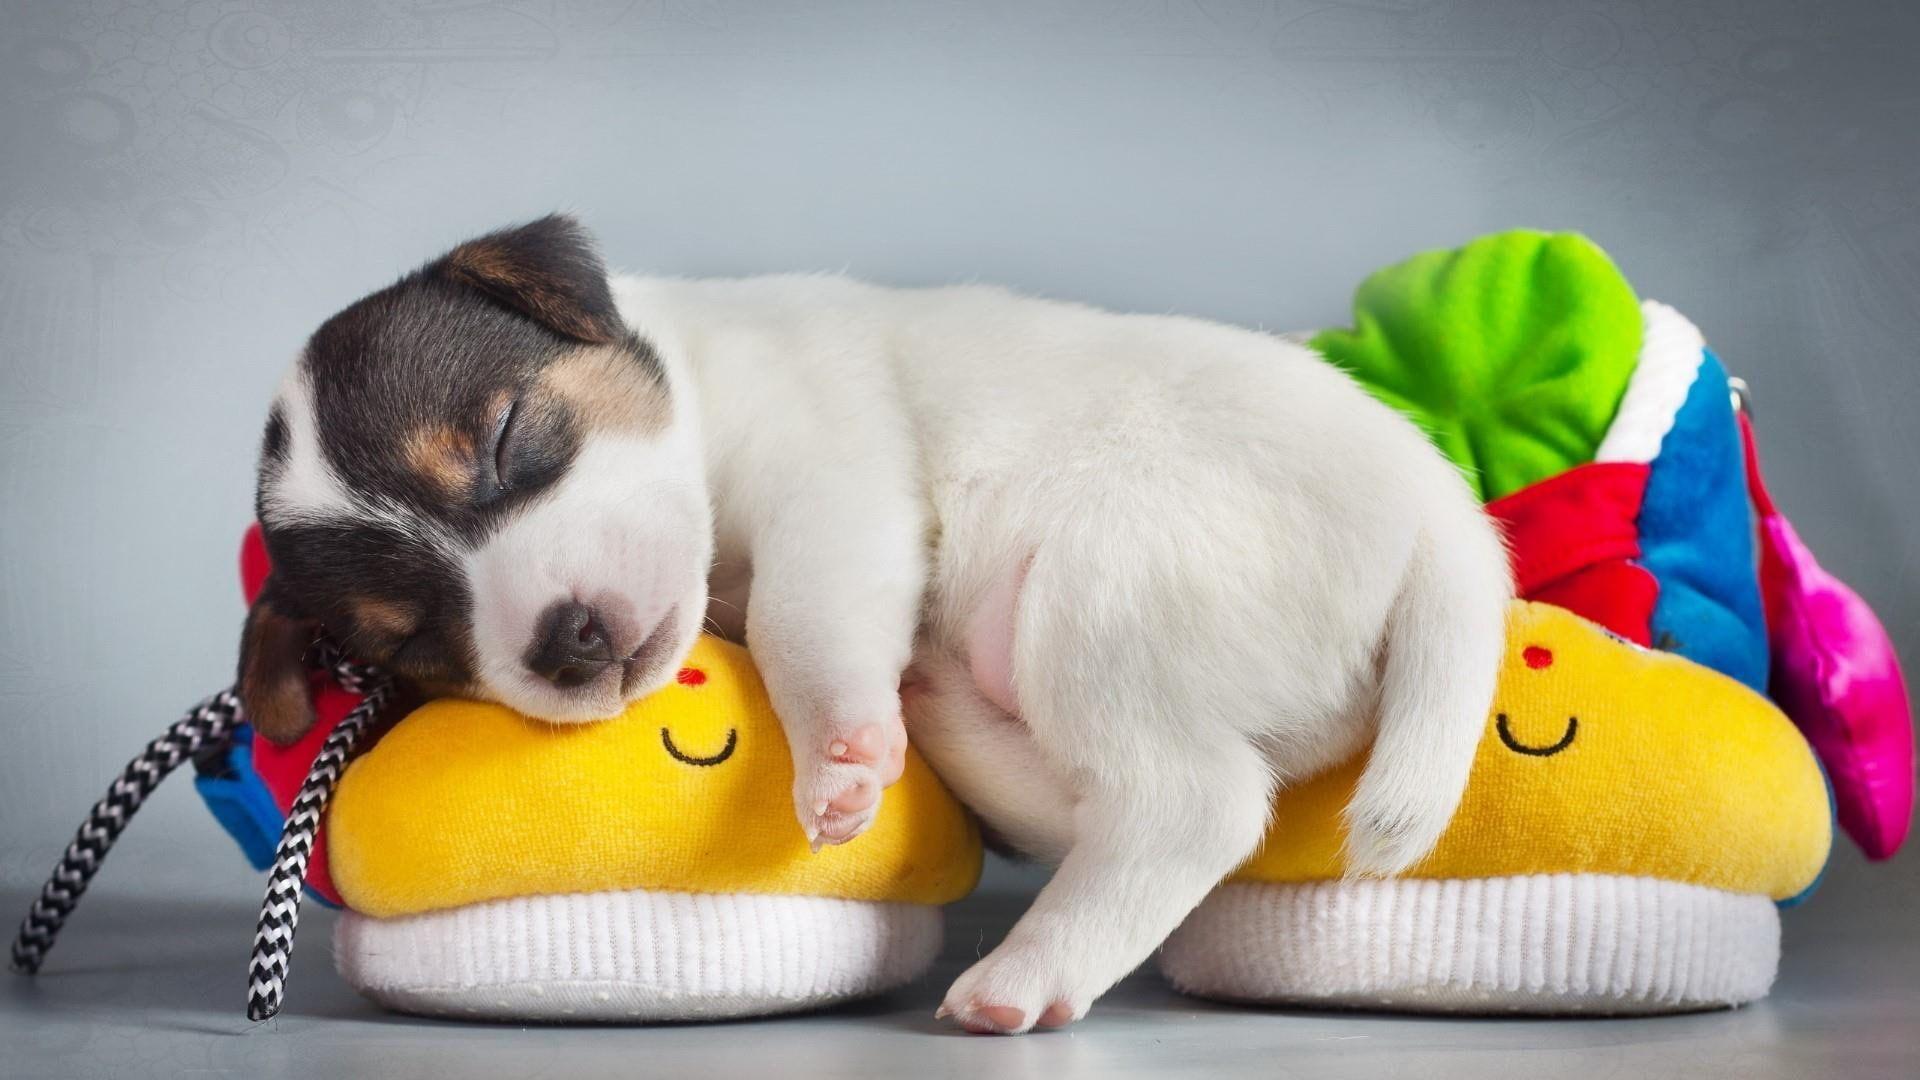 Puppy Cute Dog Jack Russell Sleep 1080p Wallpaper Hdwallpaper Desktop Jack Russell Tabby Kitten Orange Puppies